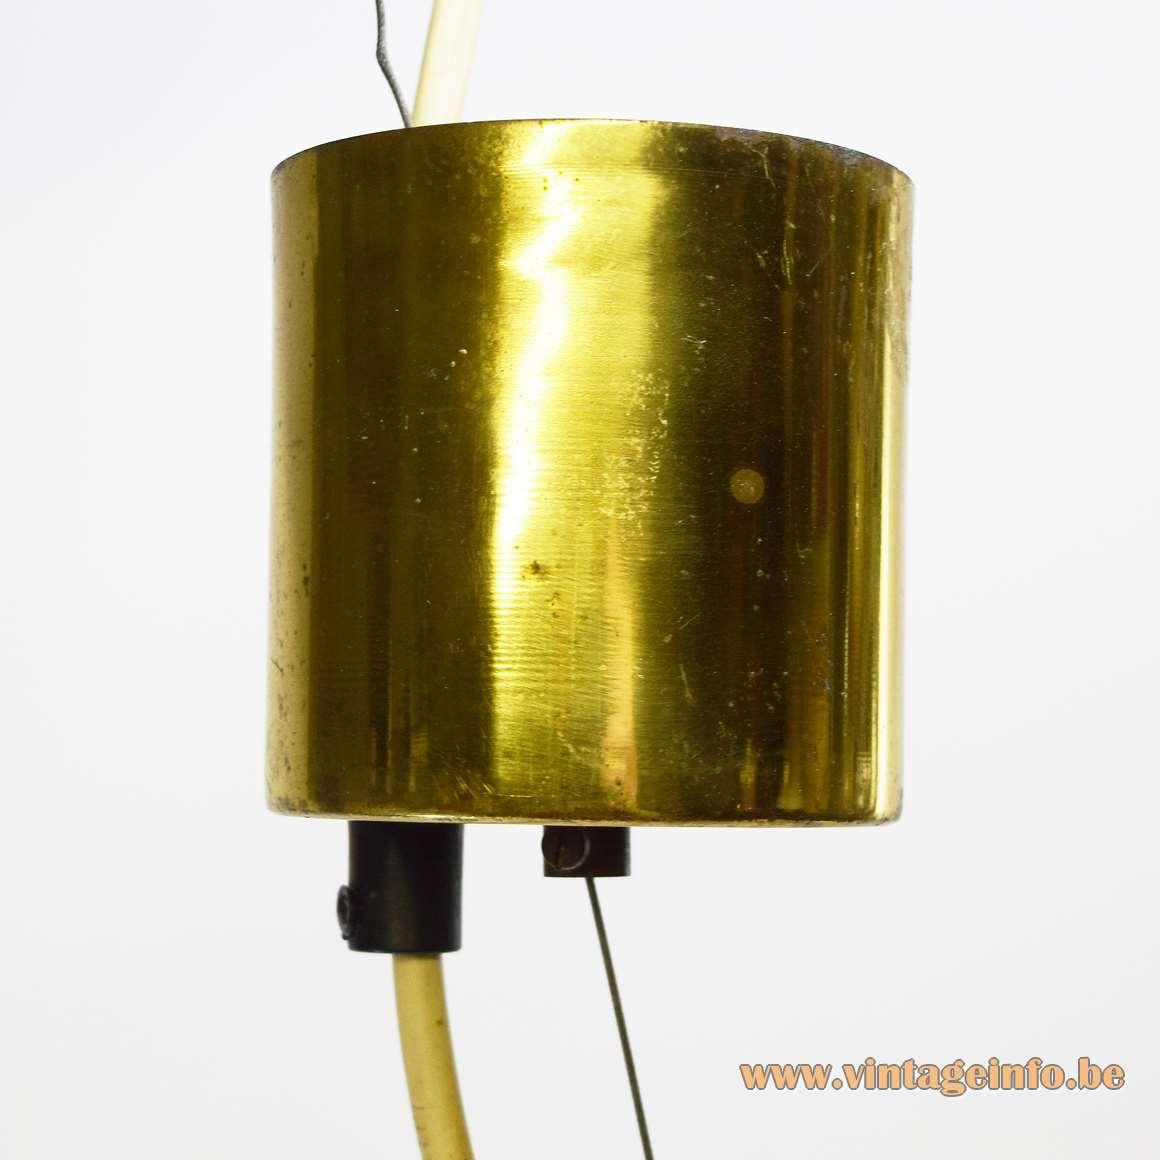 Murano Petticoat Pendant Lamp - Parts - Brass Canopy